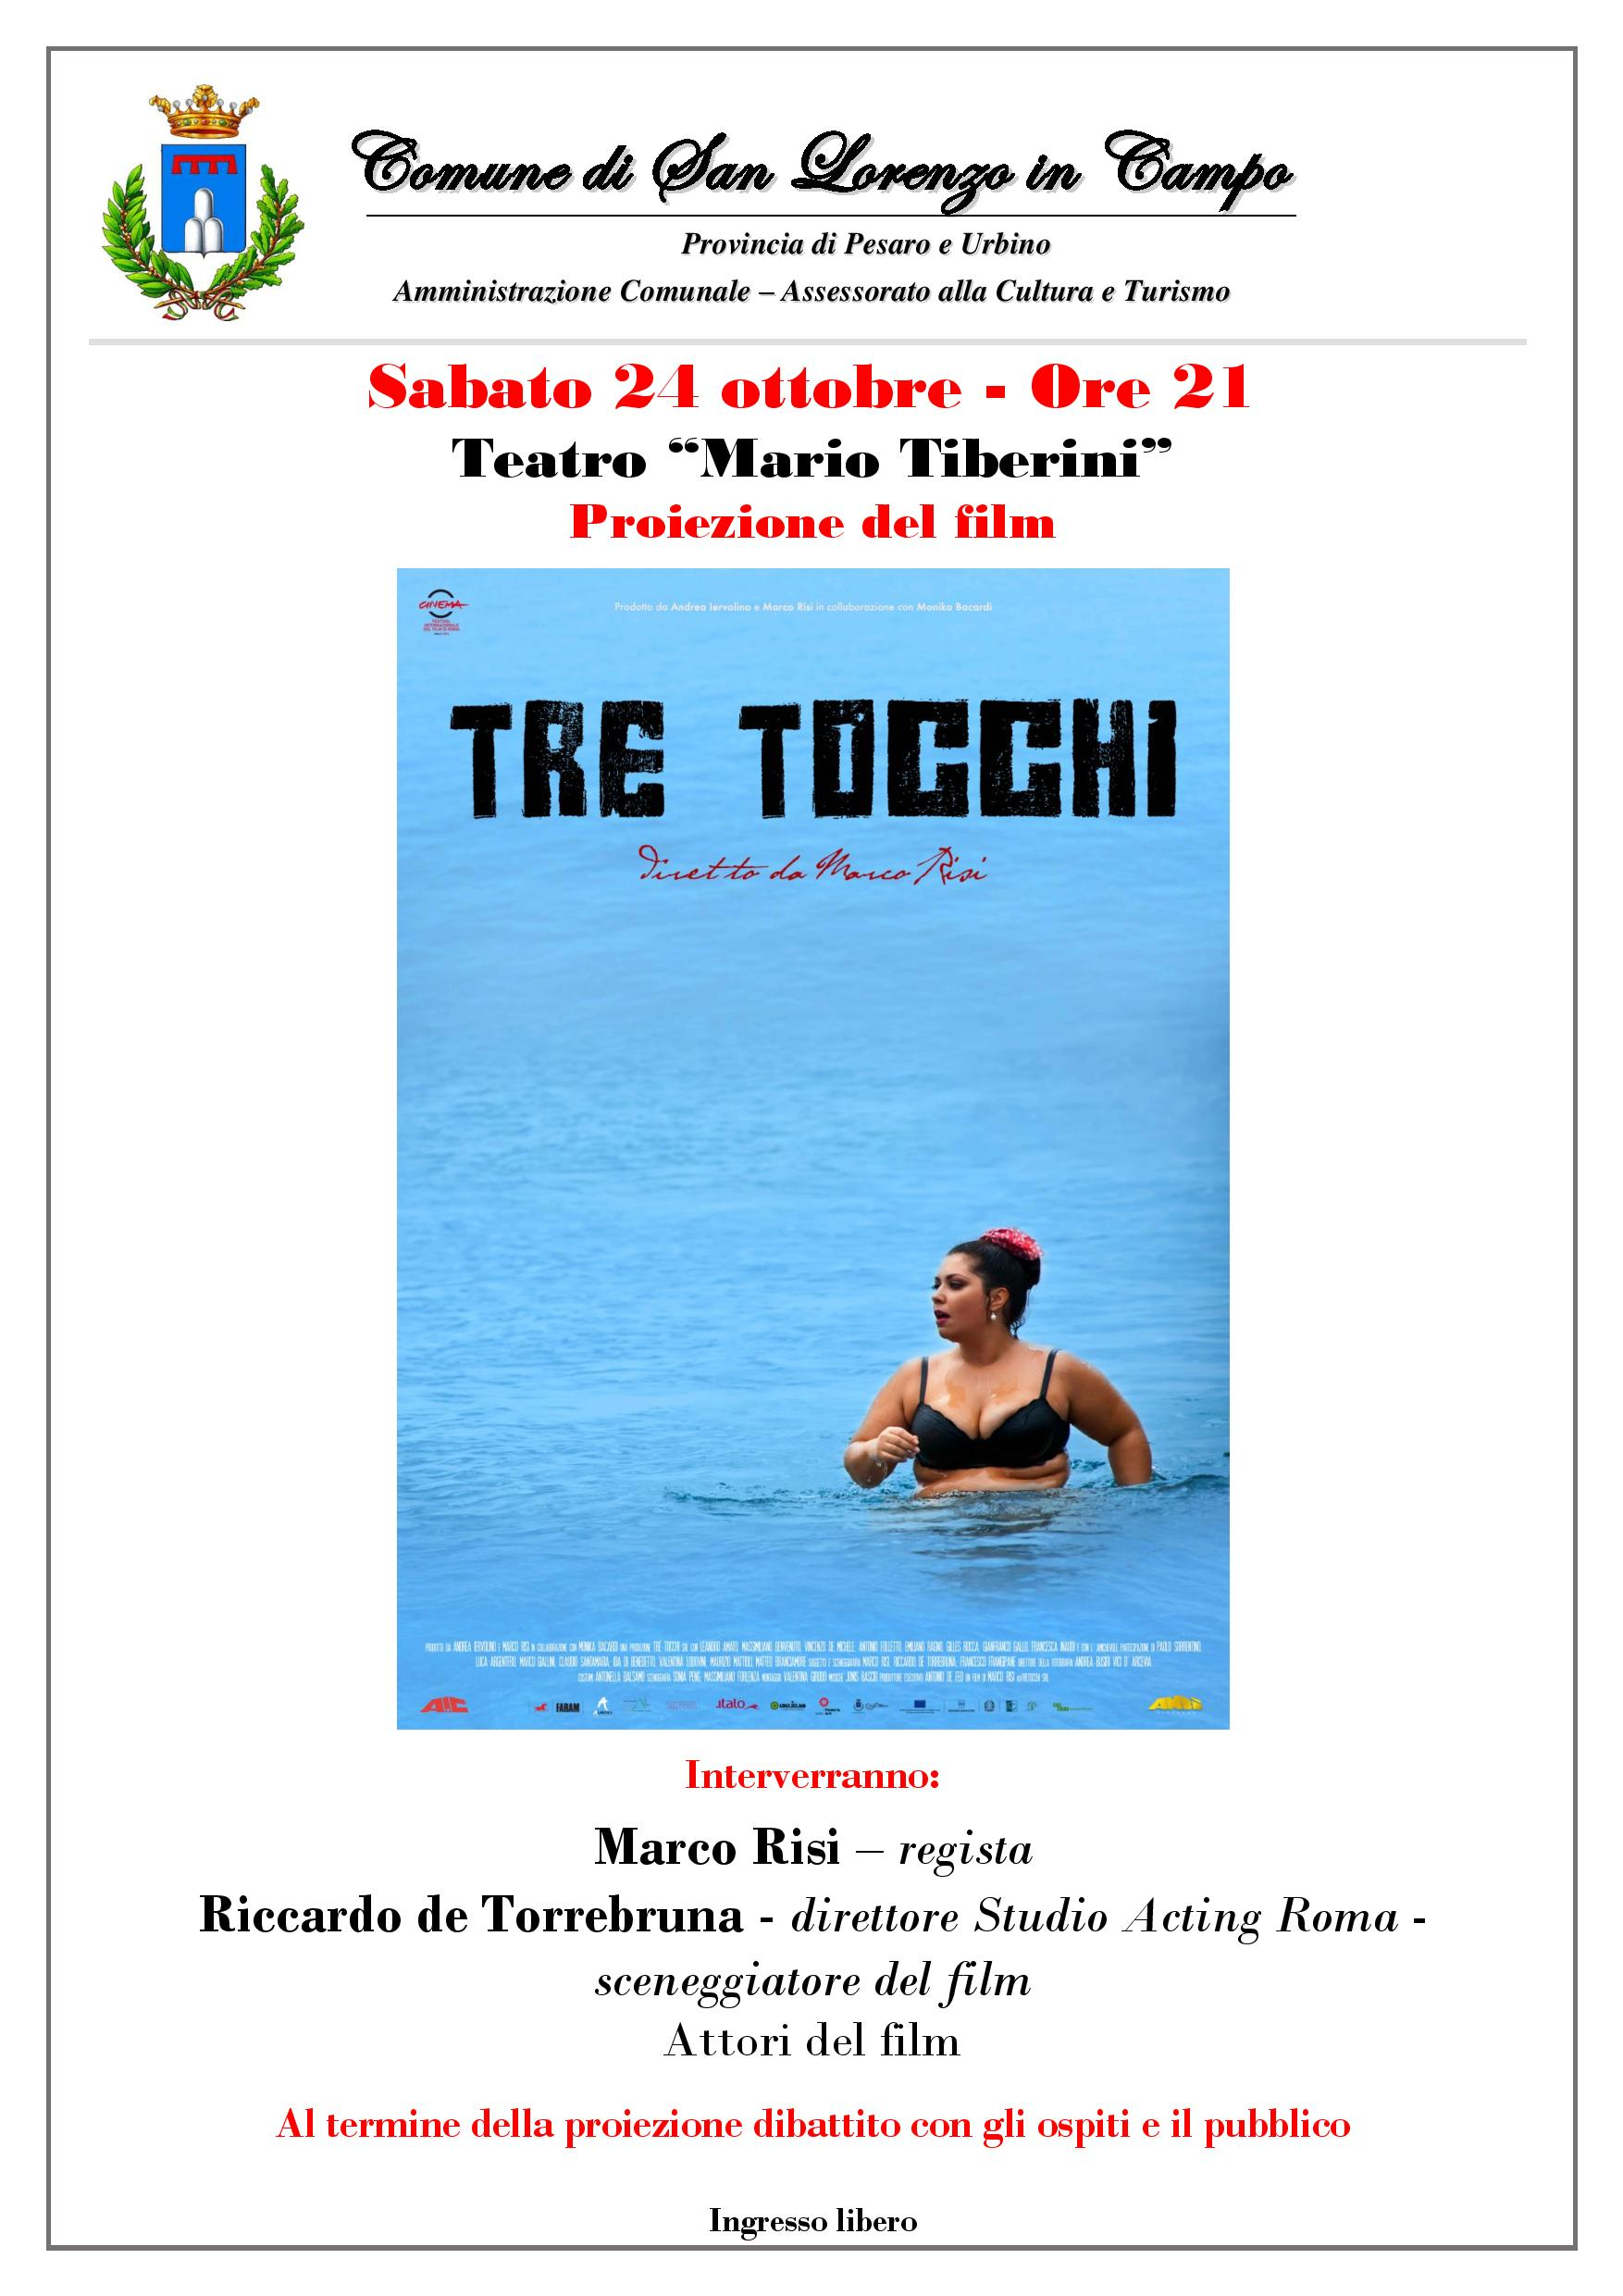 Tre-tocchi_Marco-Risi-Riccardo-de-Torrebruna_Proiezione-film_24OCT15_Locandina-page-001 (1)